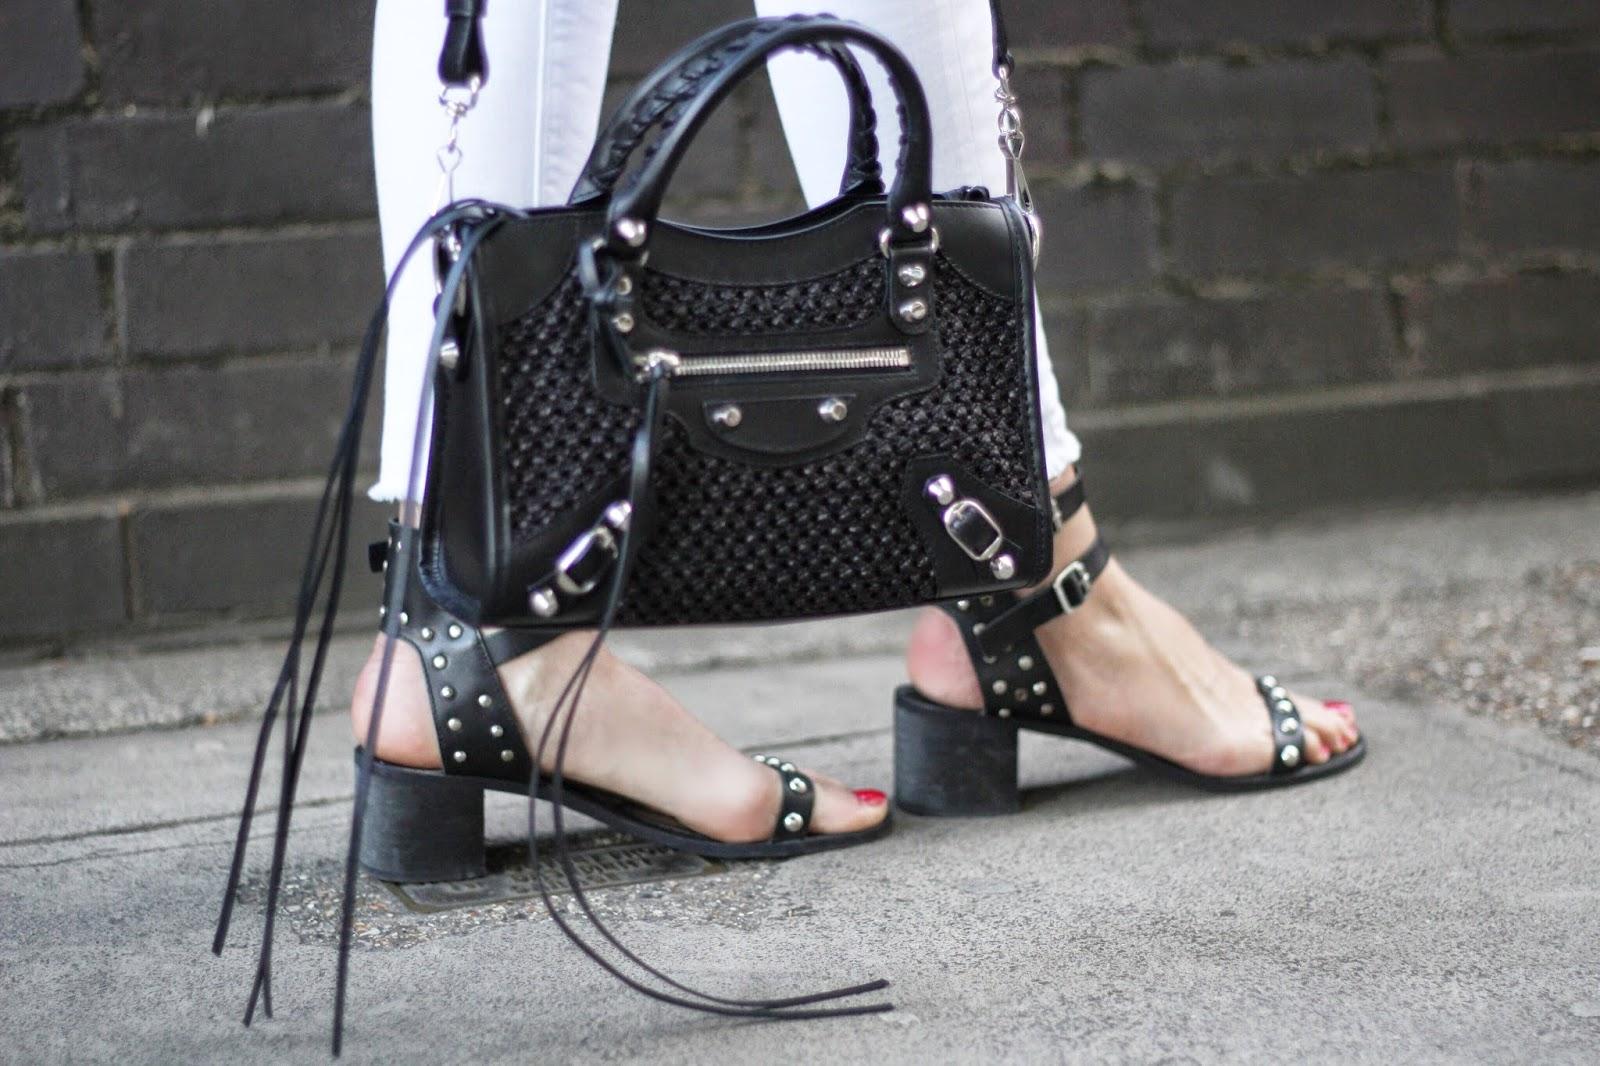 balenciaga mini city bag, balenciaga bag, balenciaga street style, kurt geiger, kurt geiger sandals, kurt geiger heels, white jeans